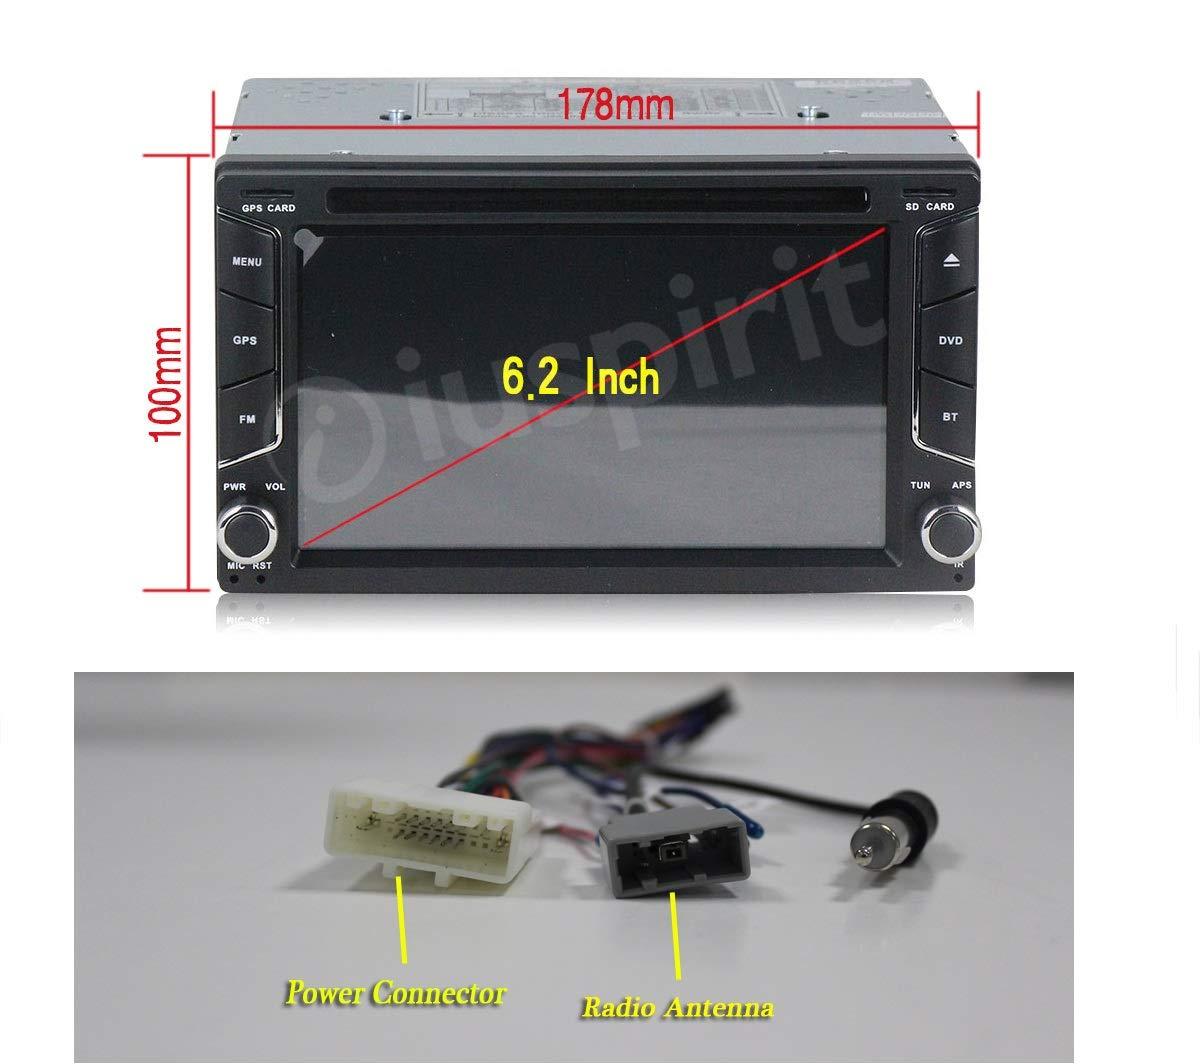 Android 7.1 4G Lte GPS DVD Autoradio 2 Din Navegador Nissan Qashqai / Nissan Juke / Nissan X-Trai l/ Nissan Tiida / Nissan Paladin / Nissan Frontier ...